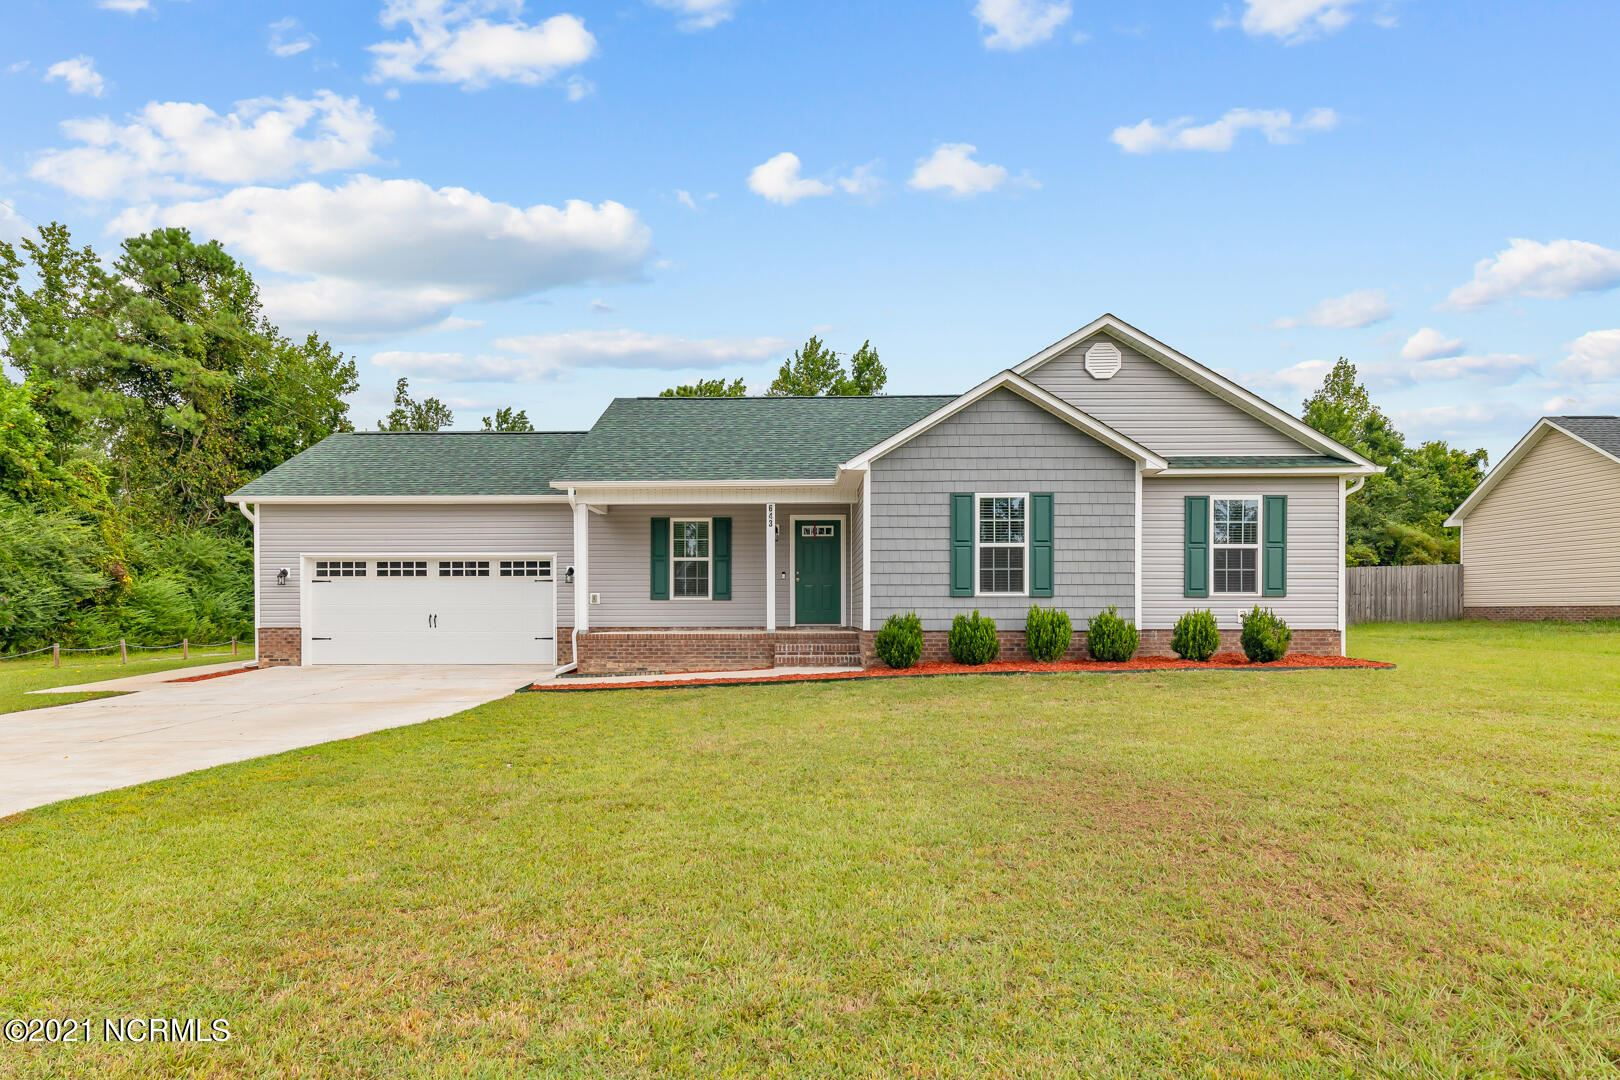 Photo of 643 Old 30 Road, Jacksonville, NC 28546 (MLS # 100291633)